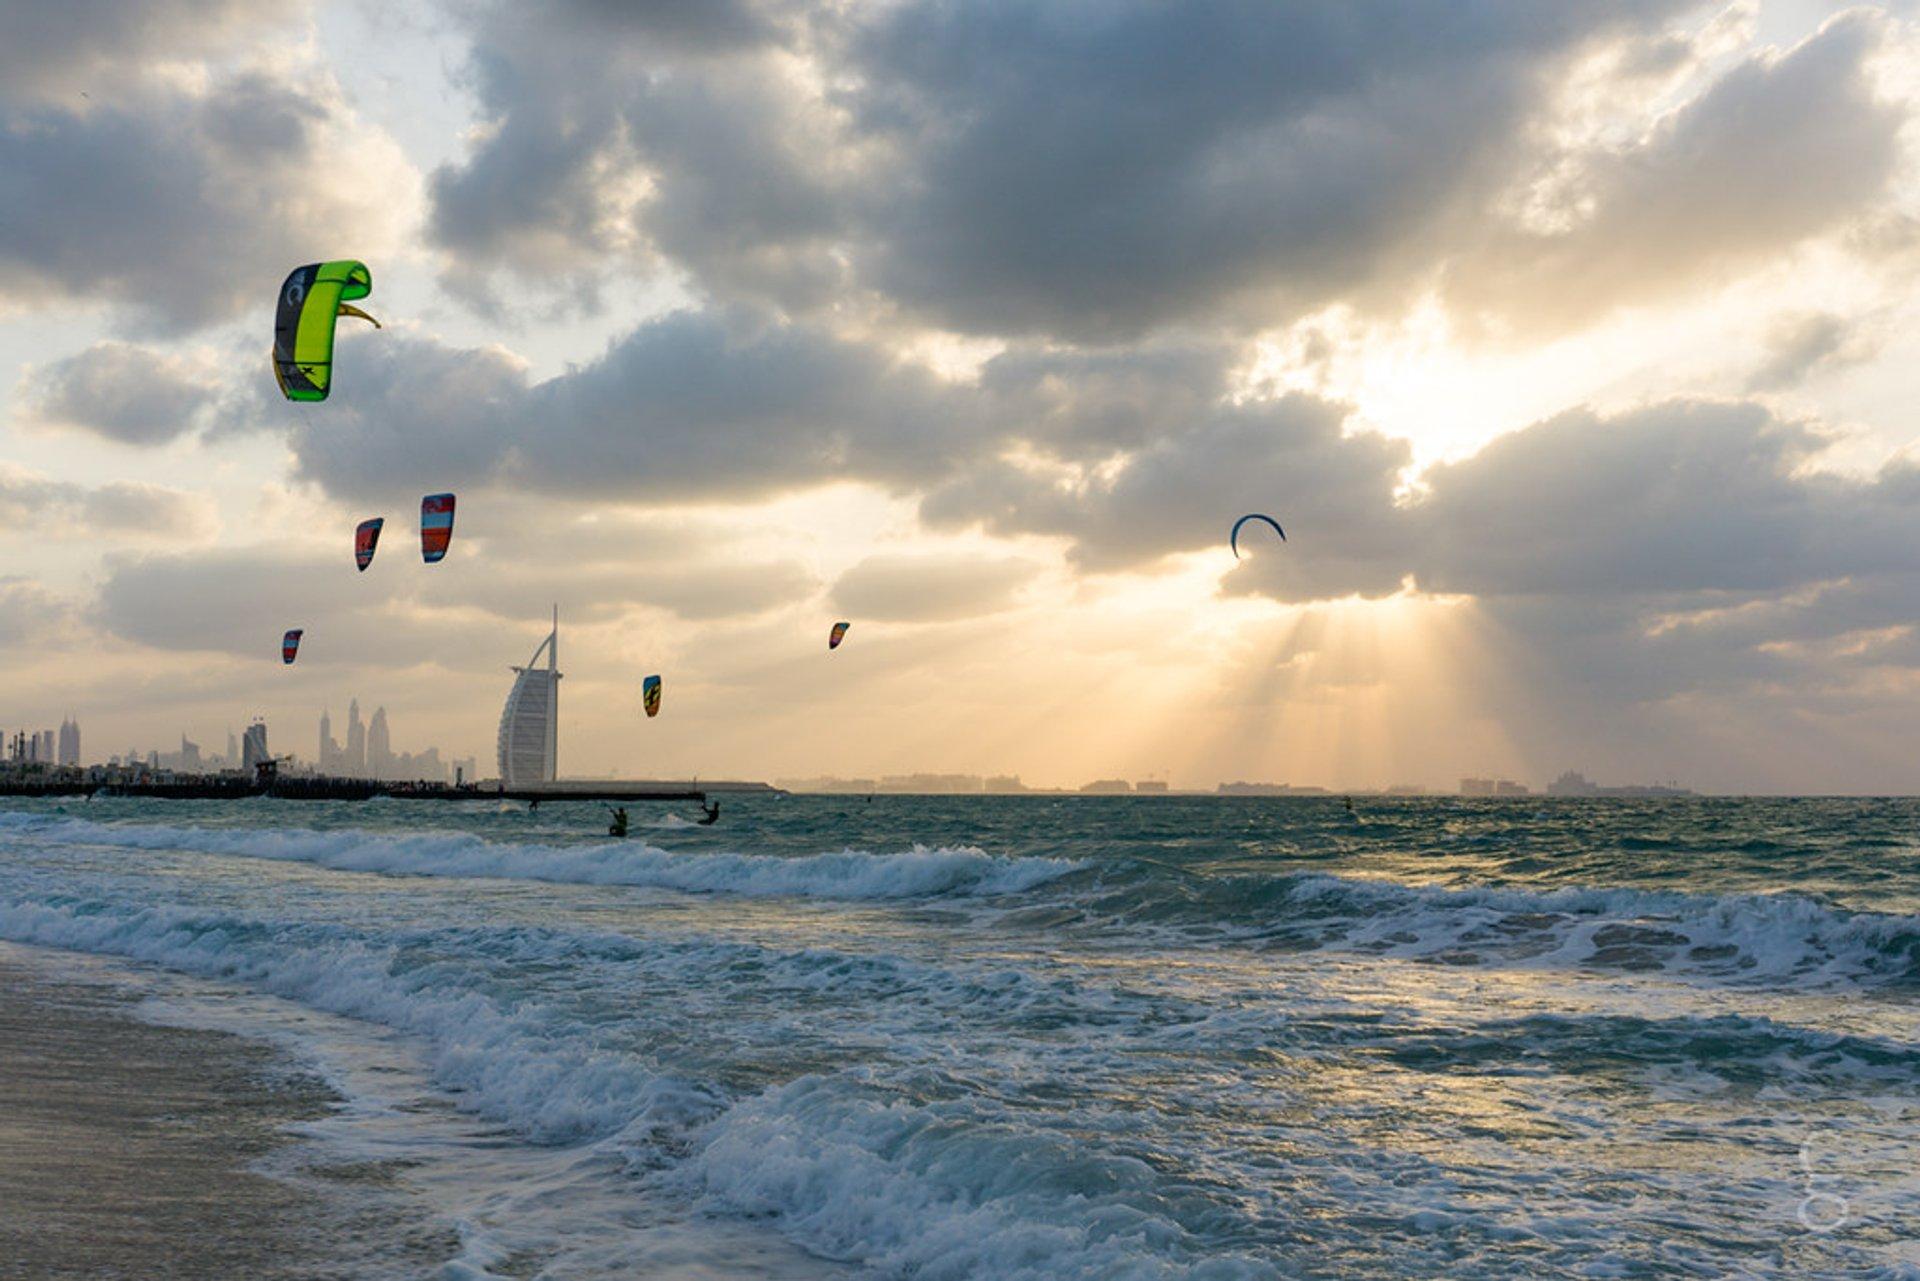 Kitesurfing and Windsurfing in Dubai 2020 - Best Time